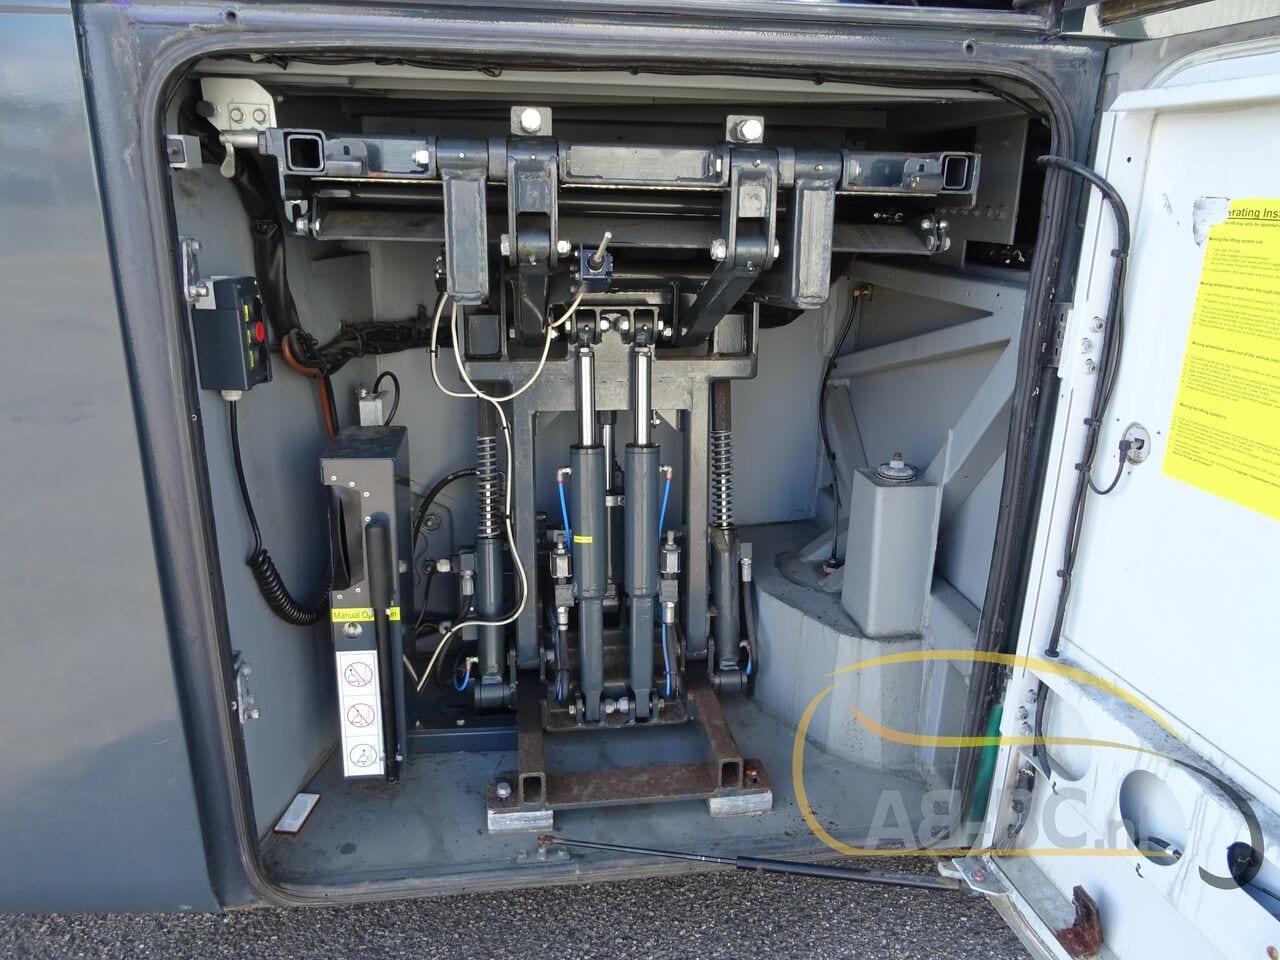 coach-busSETRA-S415-GT-HD-FINAL-EDITION-51-SEATS-LIFTBUS---1620381714006038616_big_c94241e9f8819f1f2f213b9380871e30--21050713010665719300